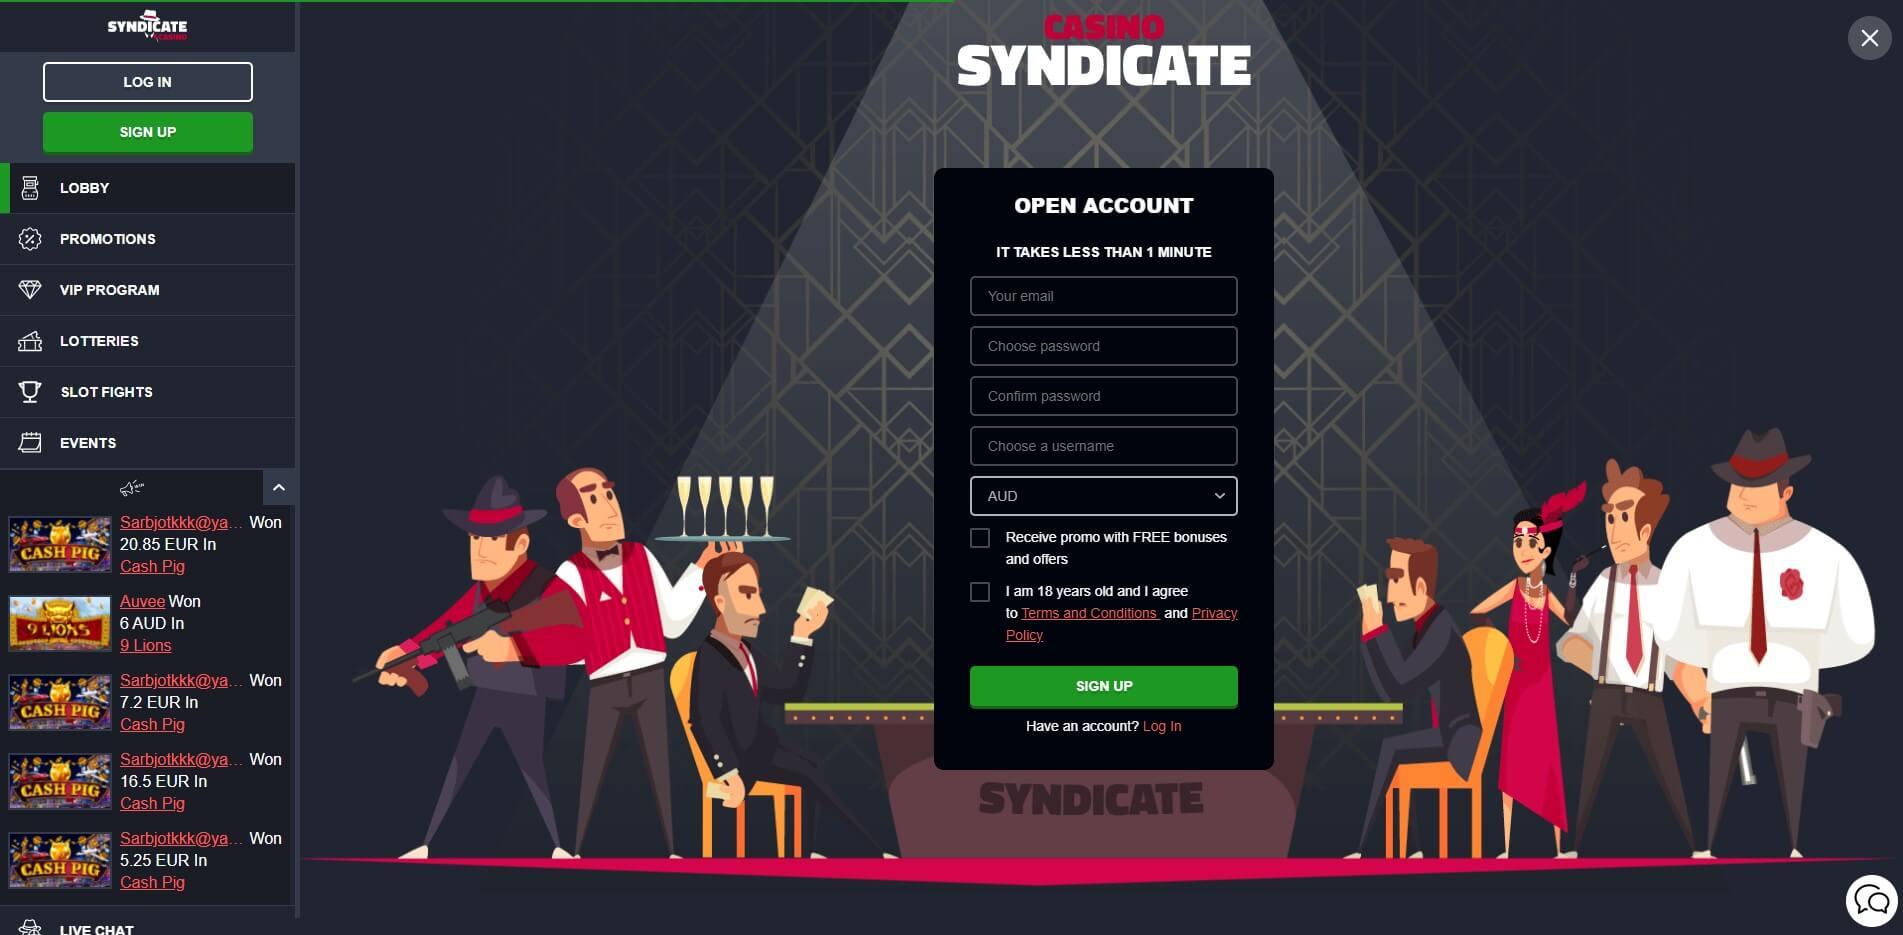 Syndicate Casino Sign Up Screenshot